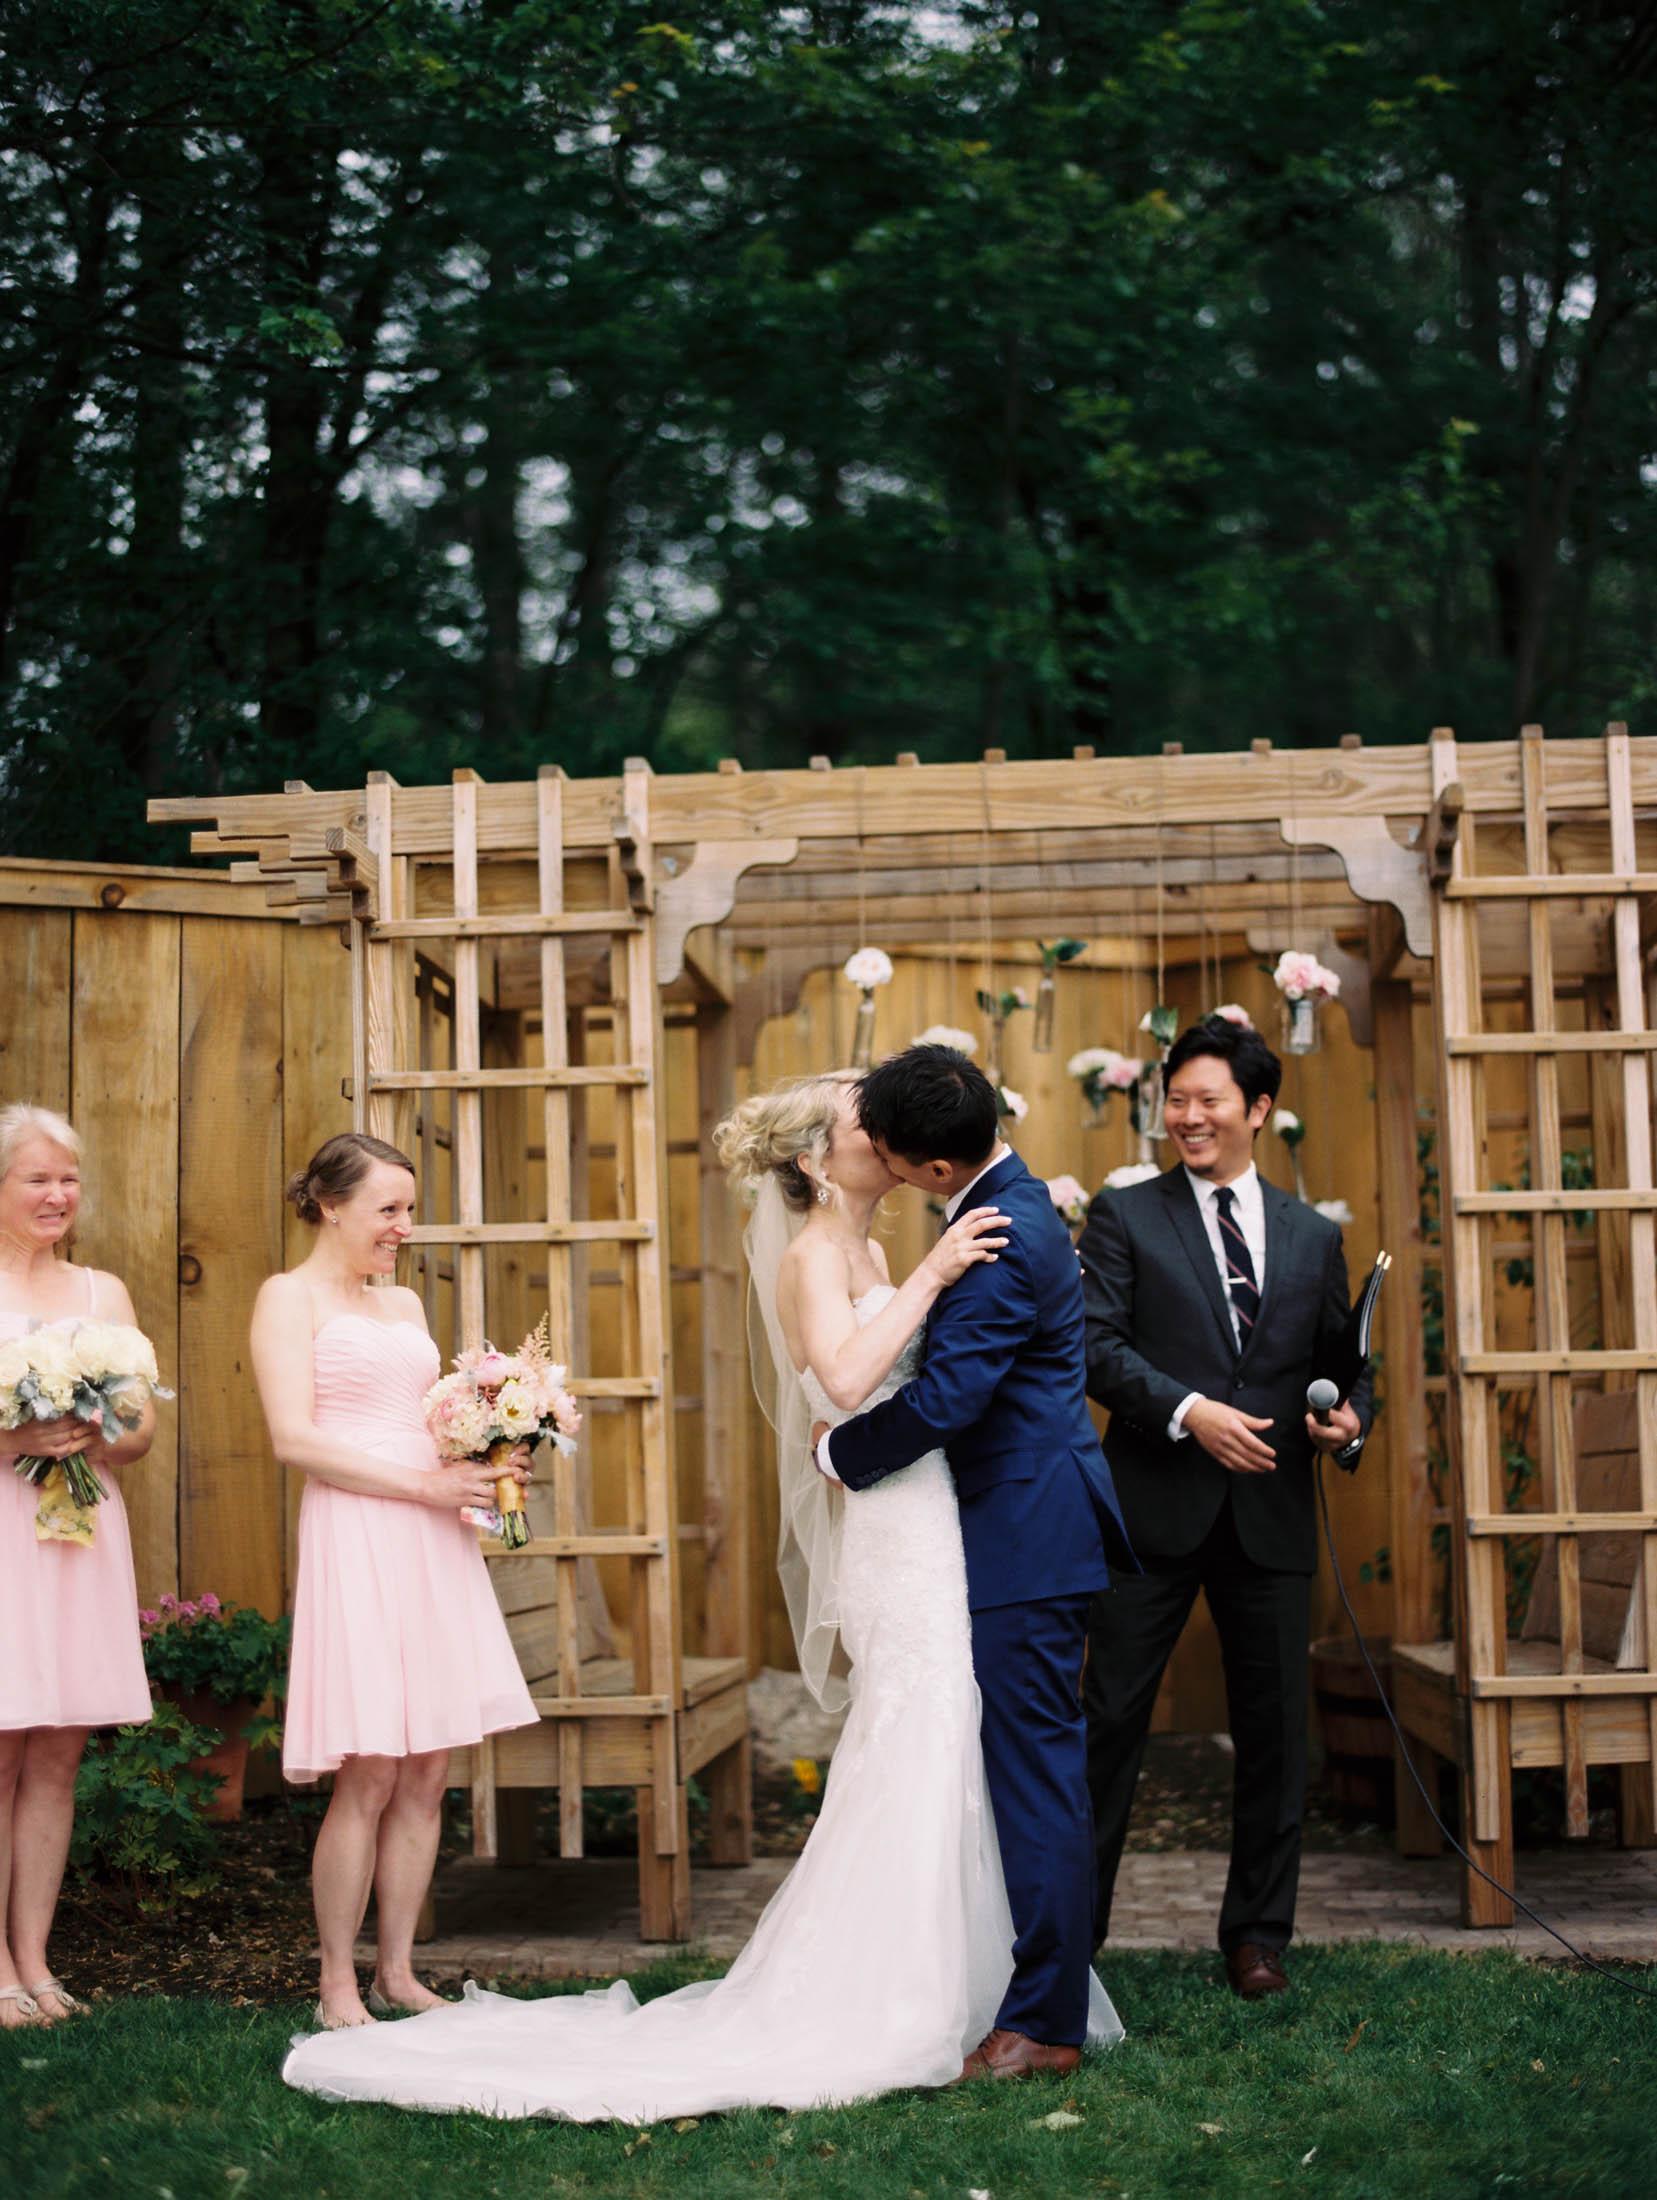 Blissful-Meadows-wedding-9.jpg